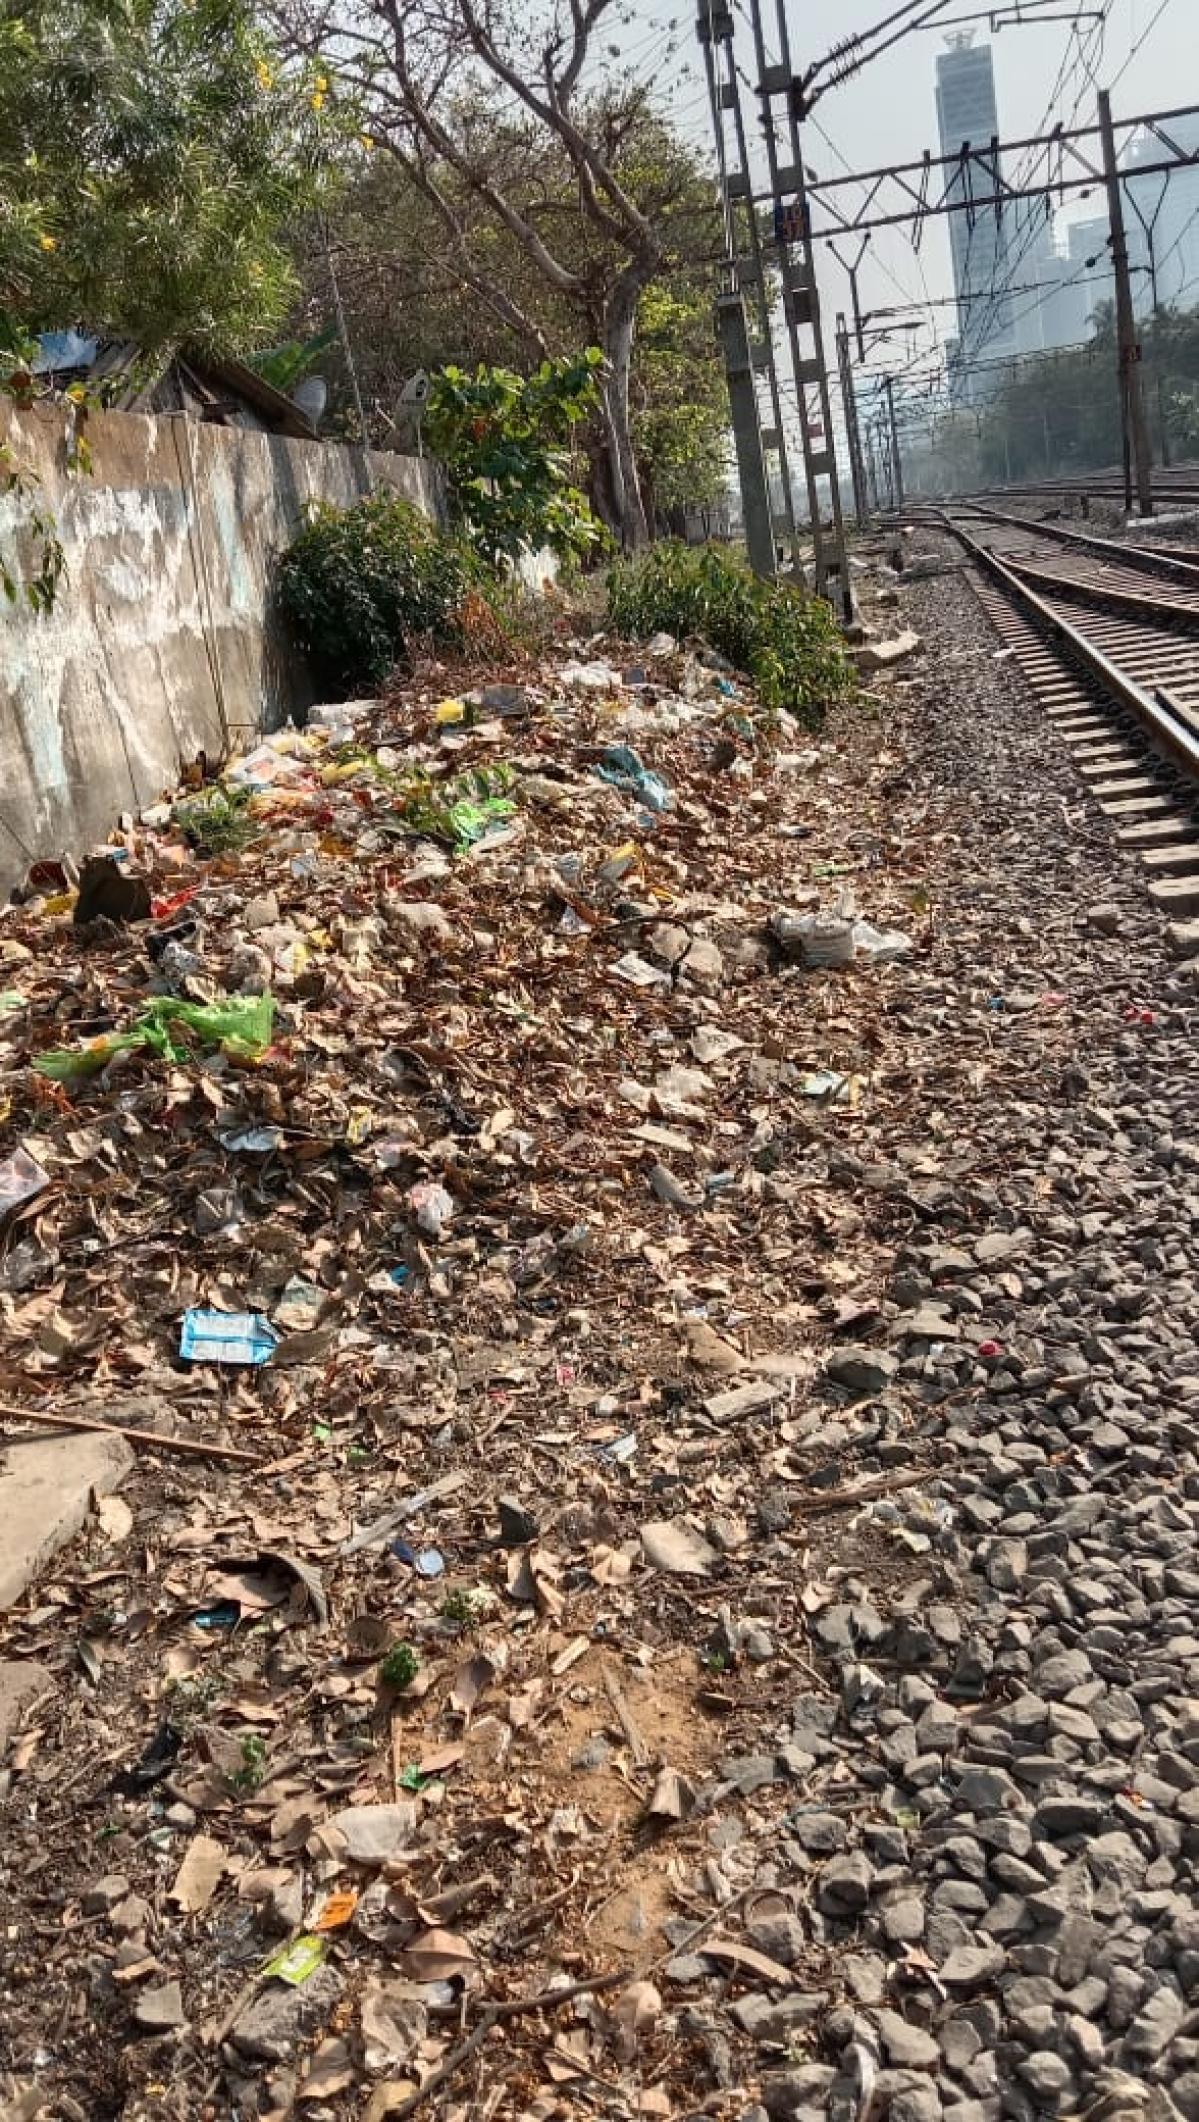 Western Railway's night muck special trains turn Mumbai suburban tracks spick & span